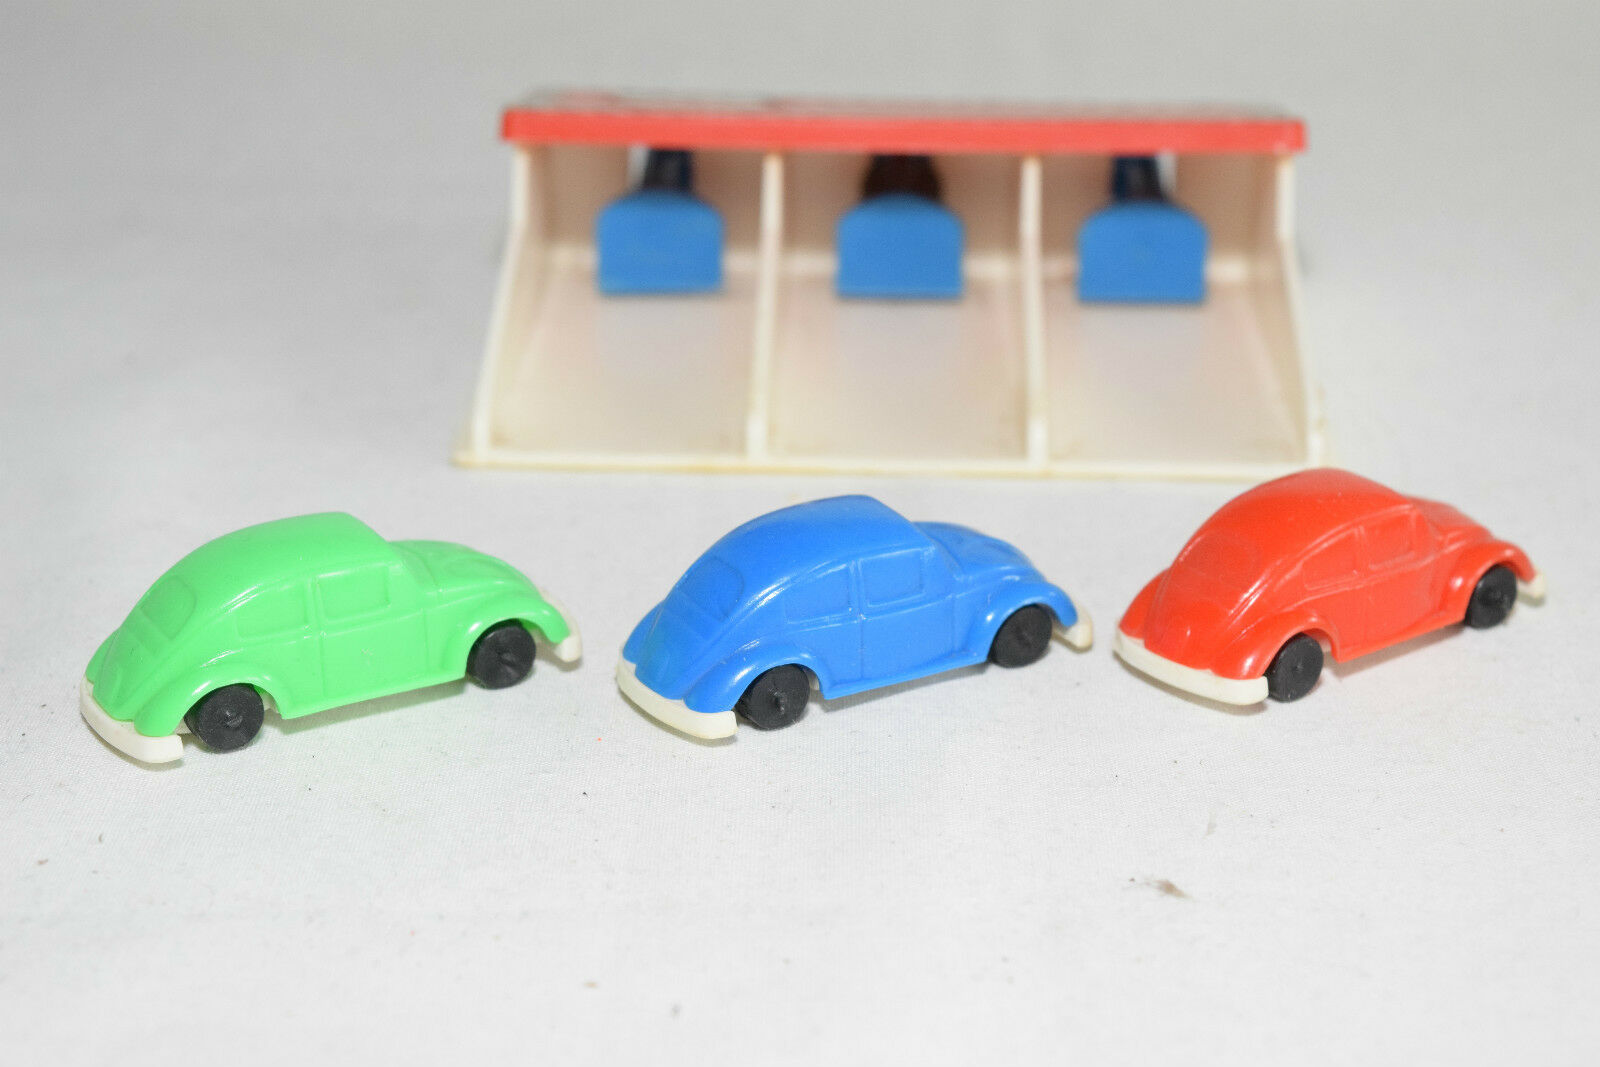 SHAMBERS SPAIN PLASTIC VW VOLKSWAGEN BEETLE KAFER RACE SET SET SET NEAR MINT RARE SELTEN db5420